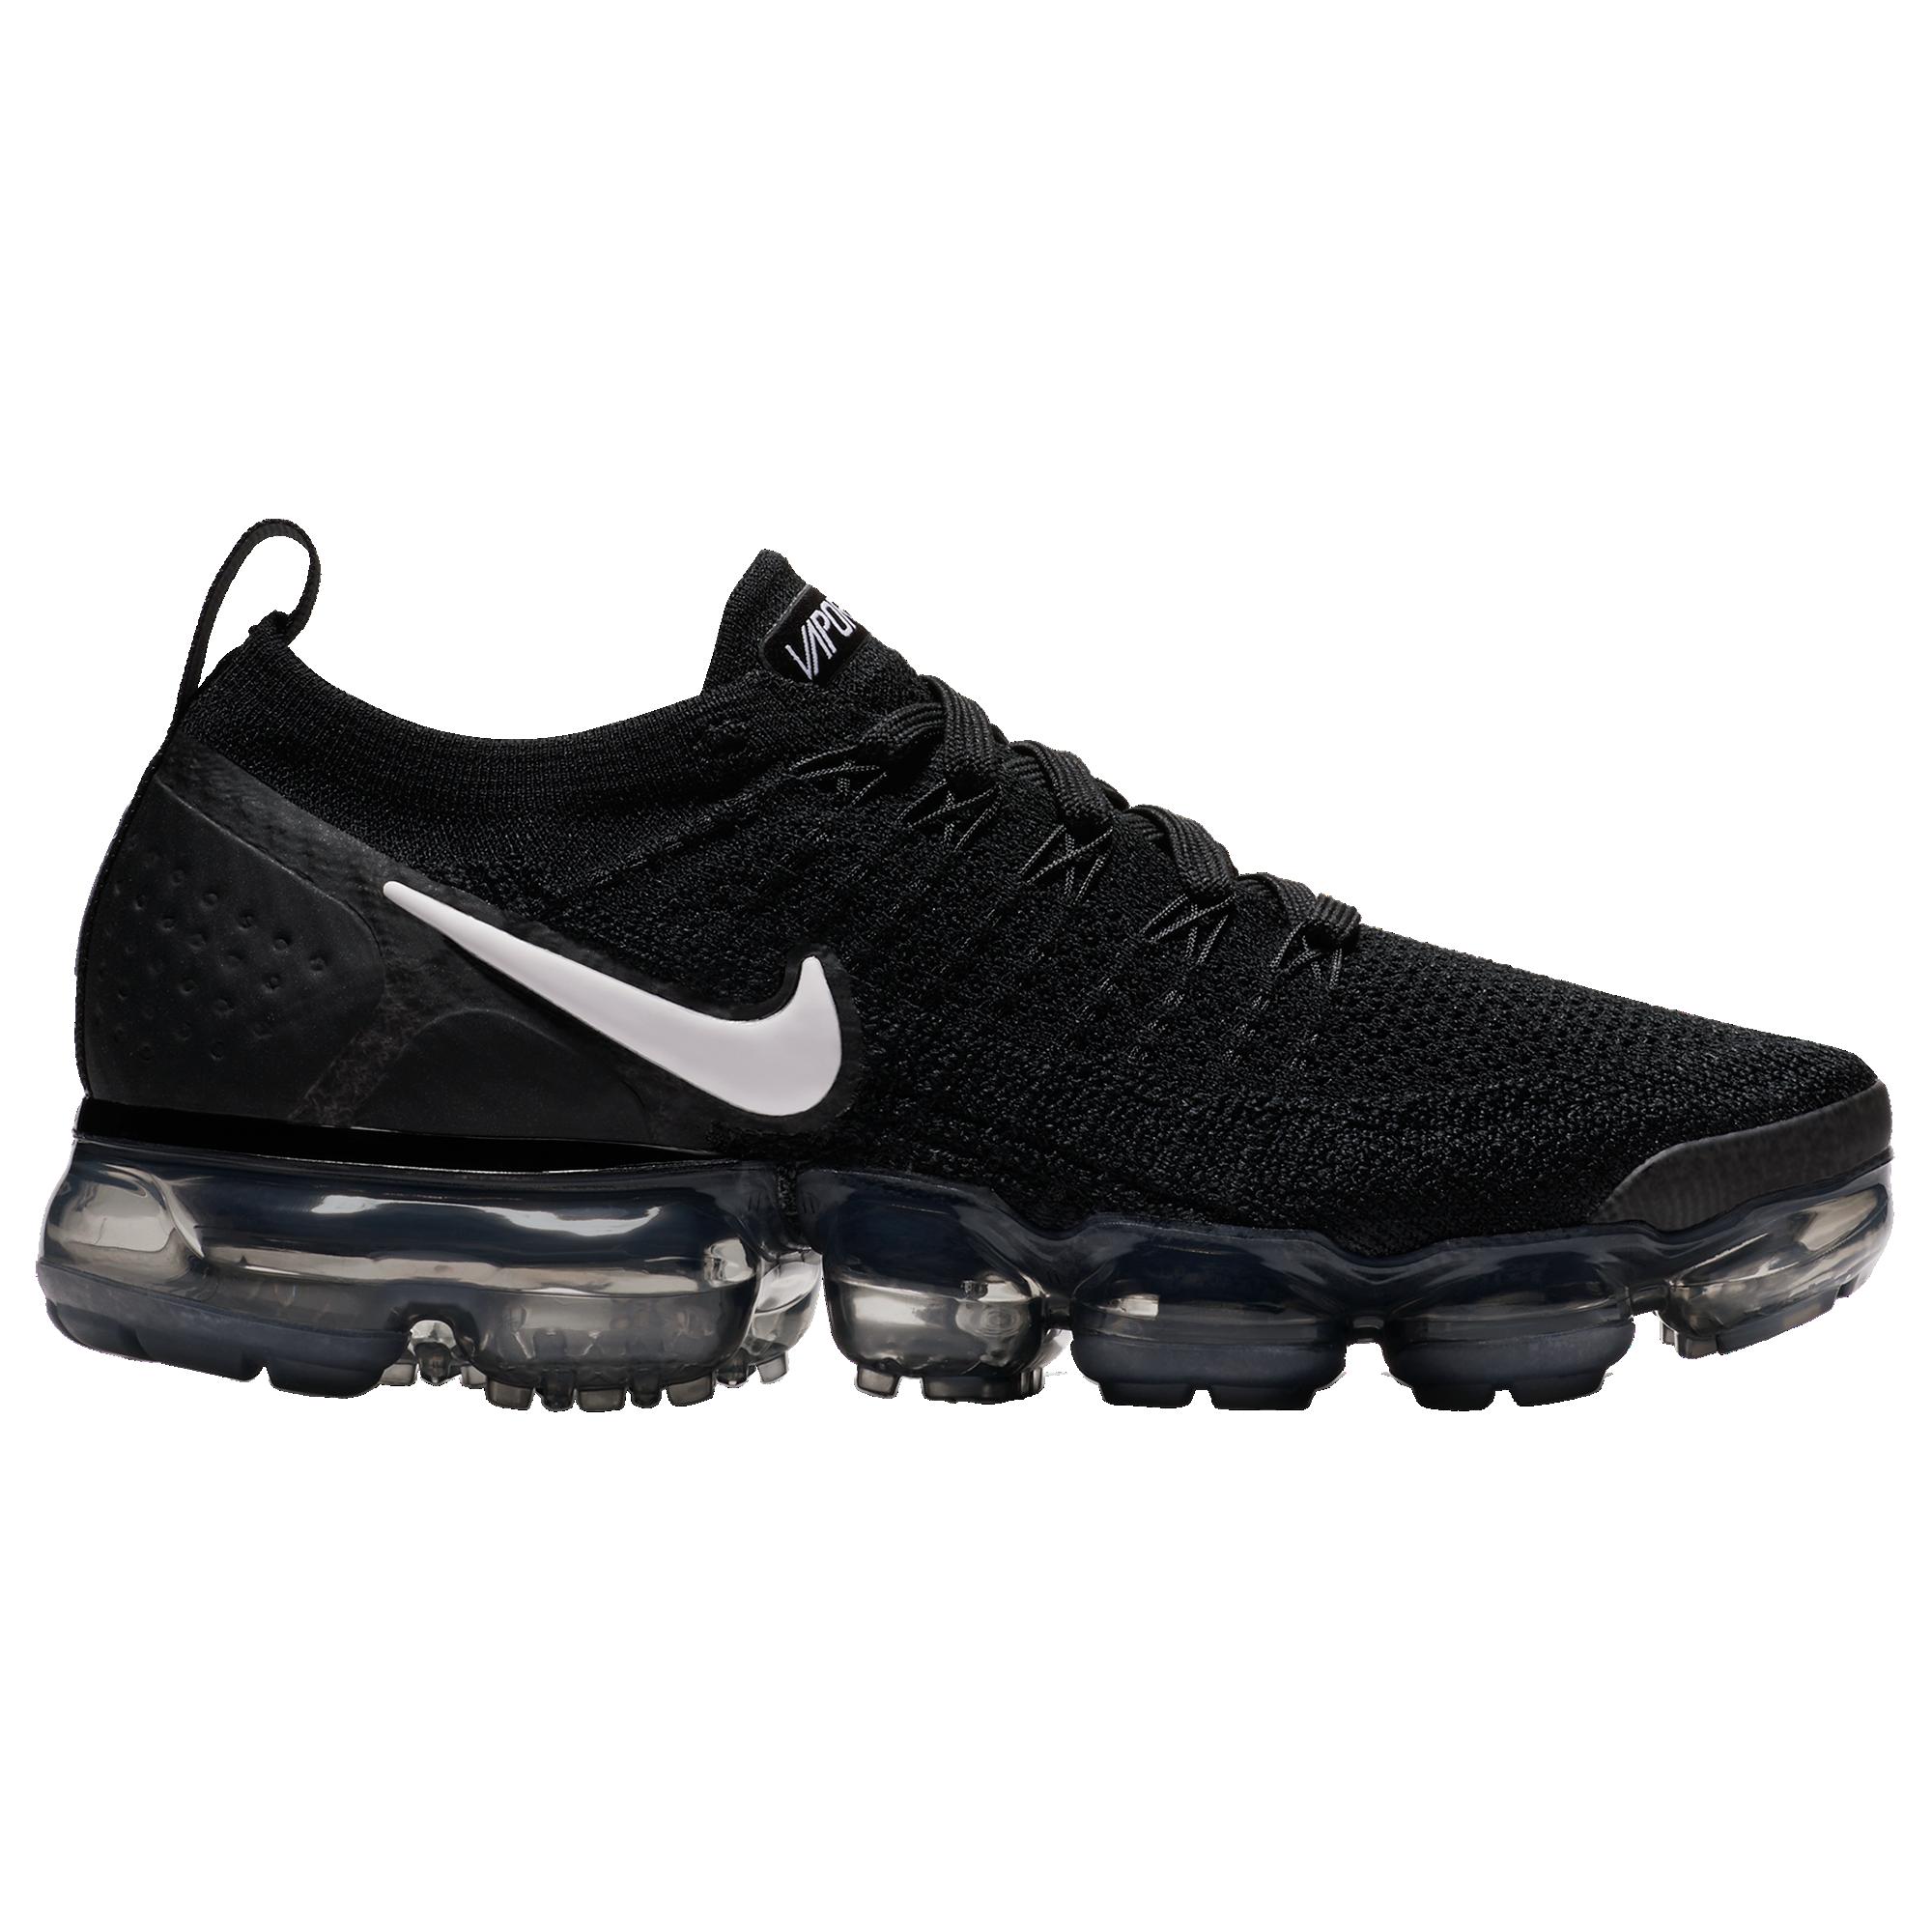 sports shoes 7eda7 6821c Nike Air VaporMax Flyknit 2 - Women's | Sneaker head | Nike ...